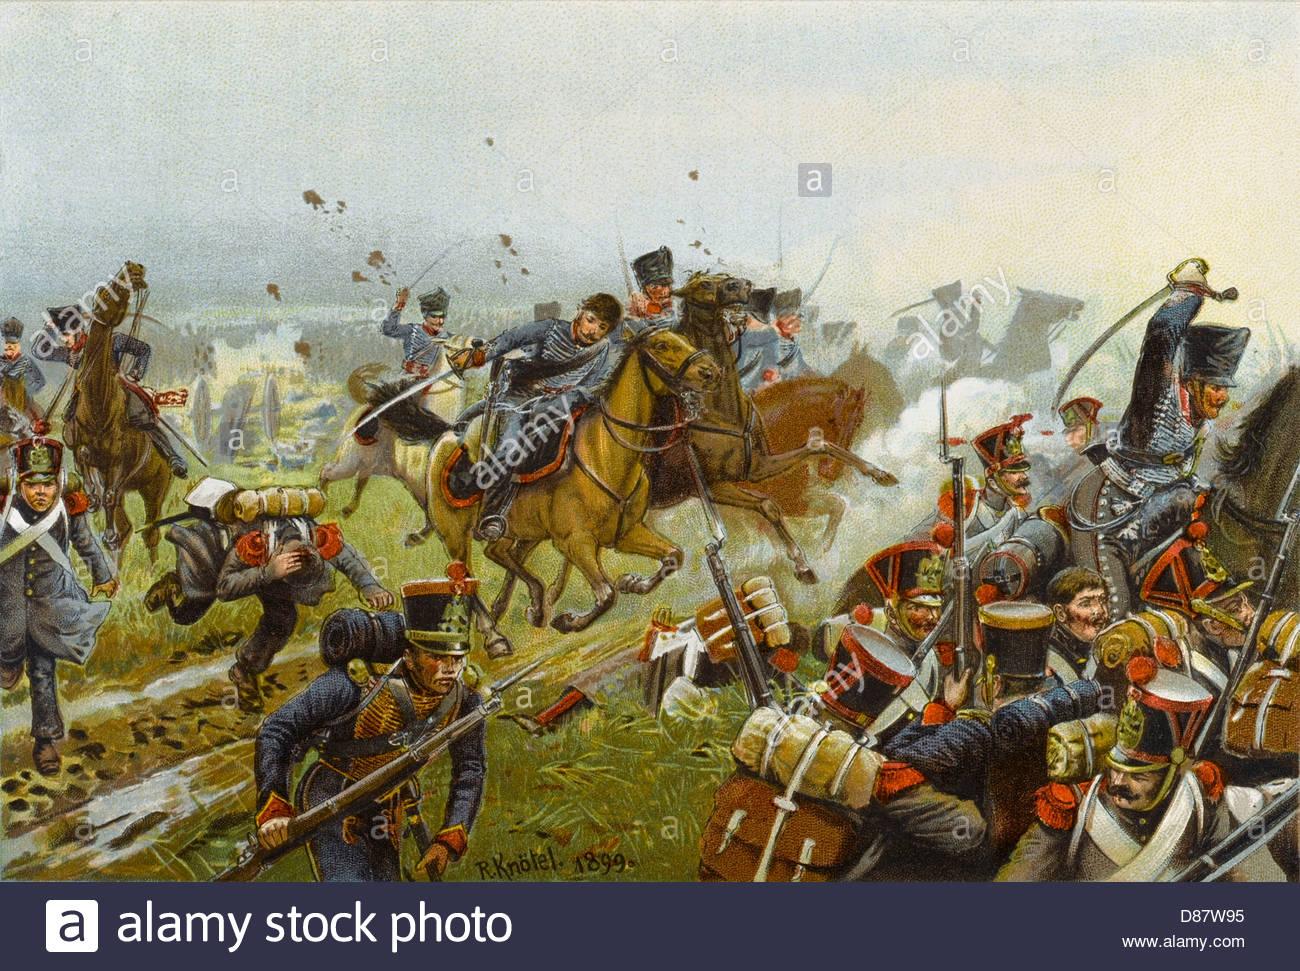 Images of Battle Of Leipzig | 1300x971